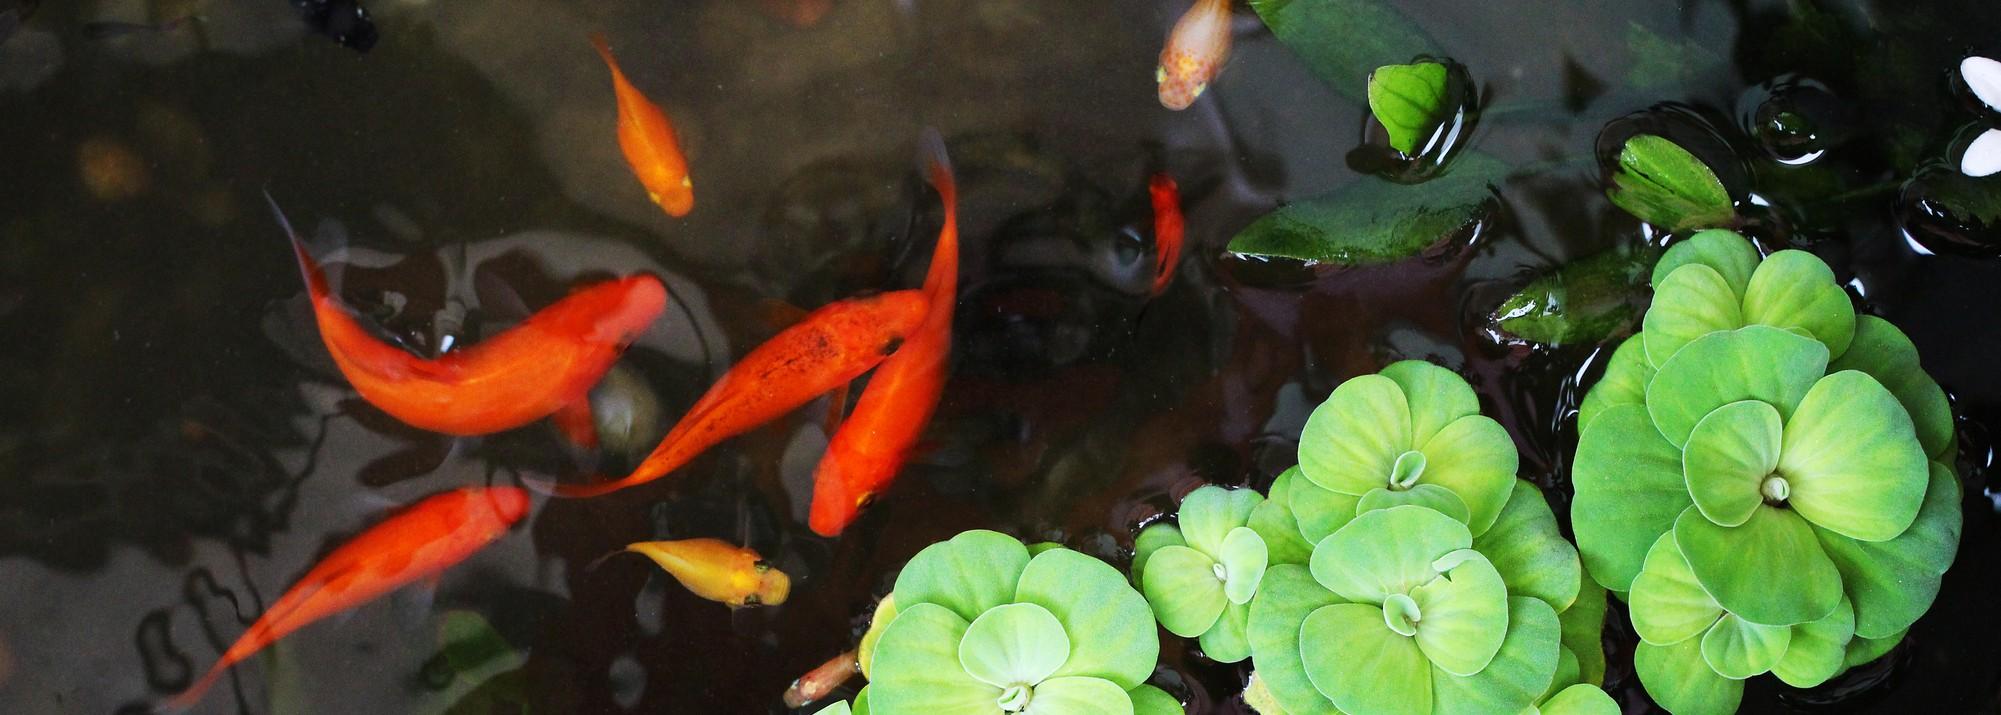 Poissons de bassin